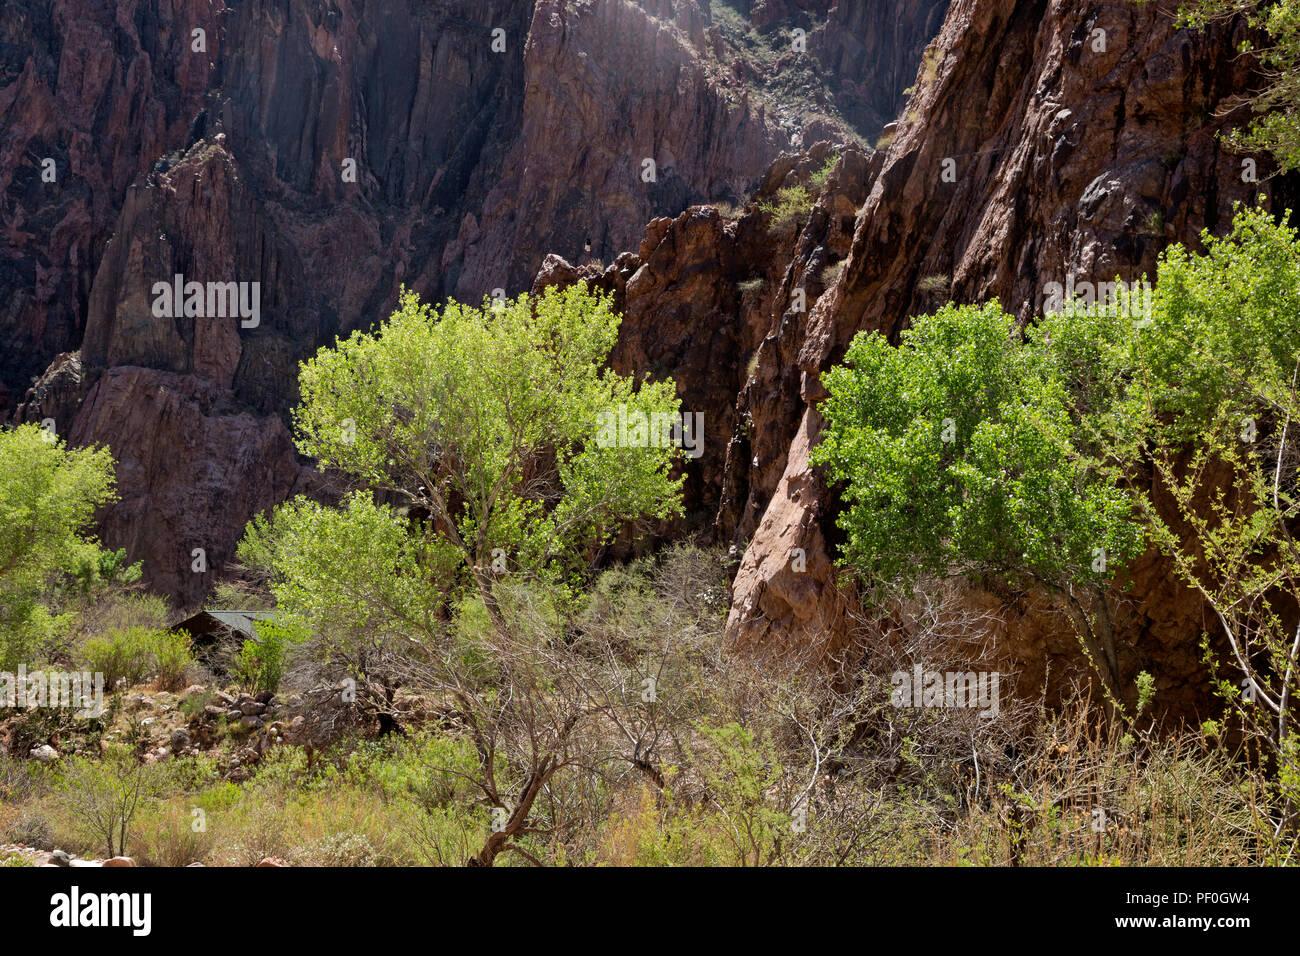 AZ00294-00...ARIZONA - Vegetation along Bright Angel Creek in the Phantom Ranch area of Grand Canyon National Park. - Stock Image